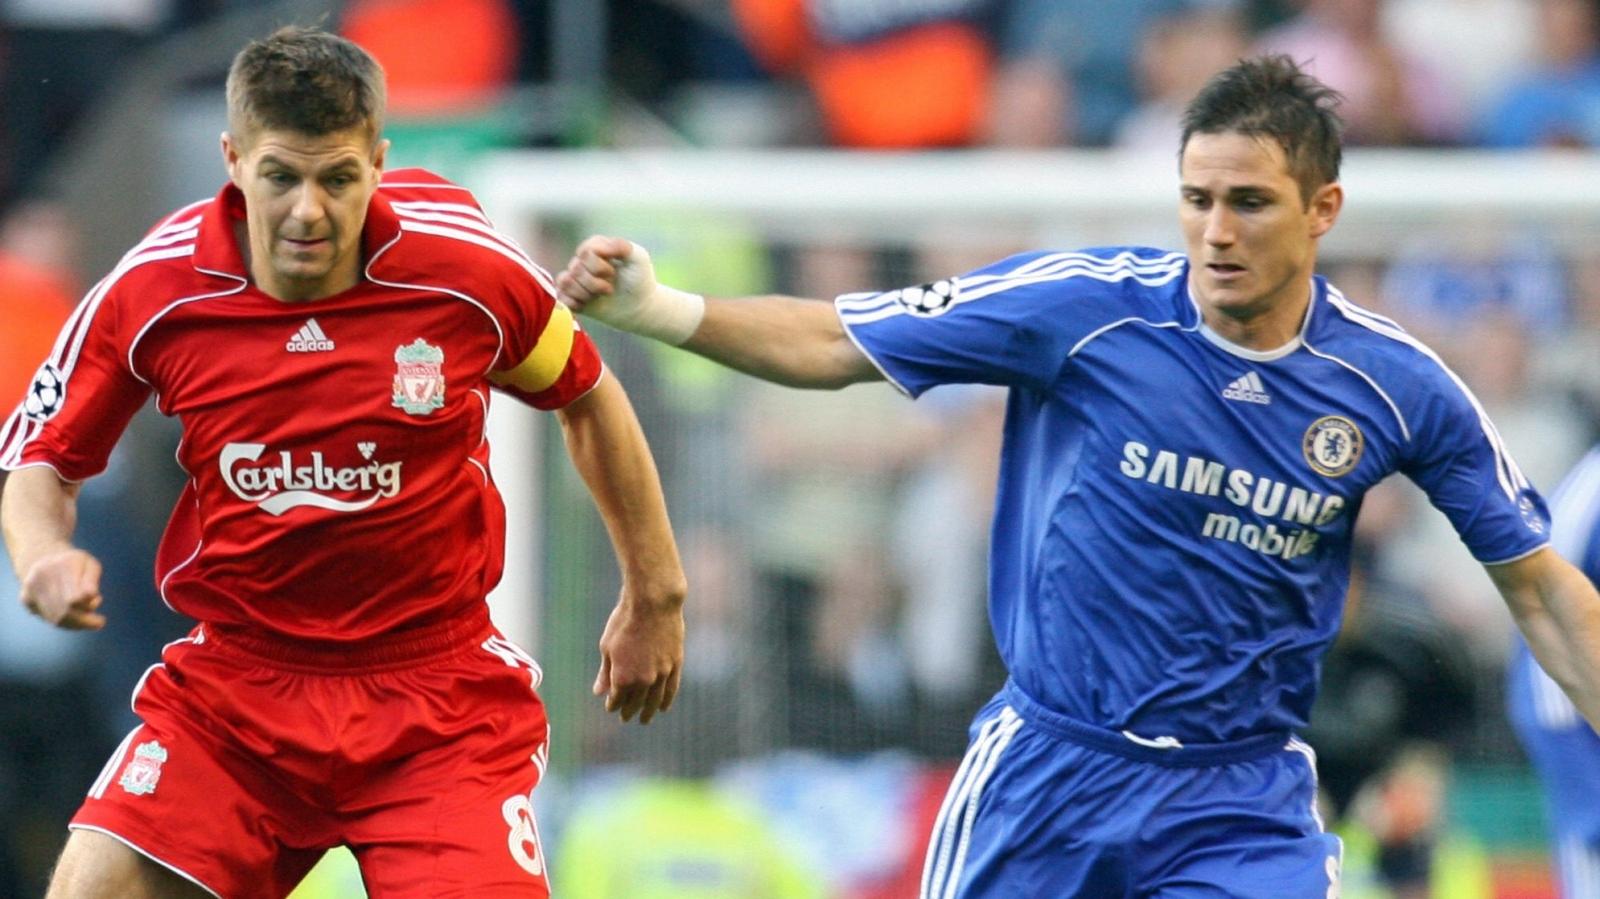 Gerrard/Lampard